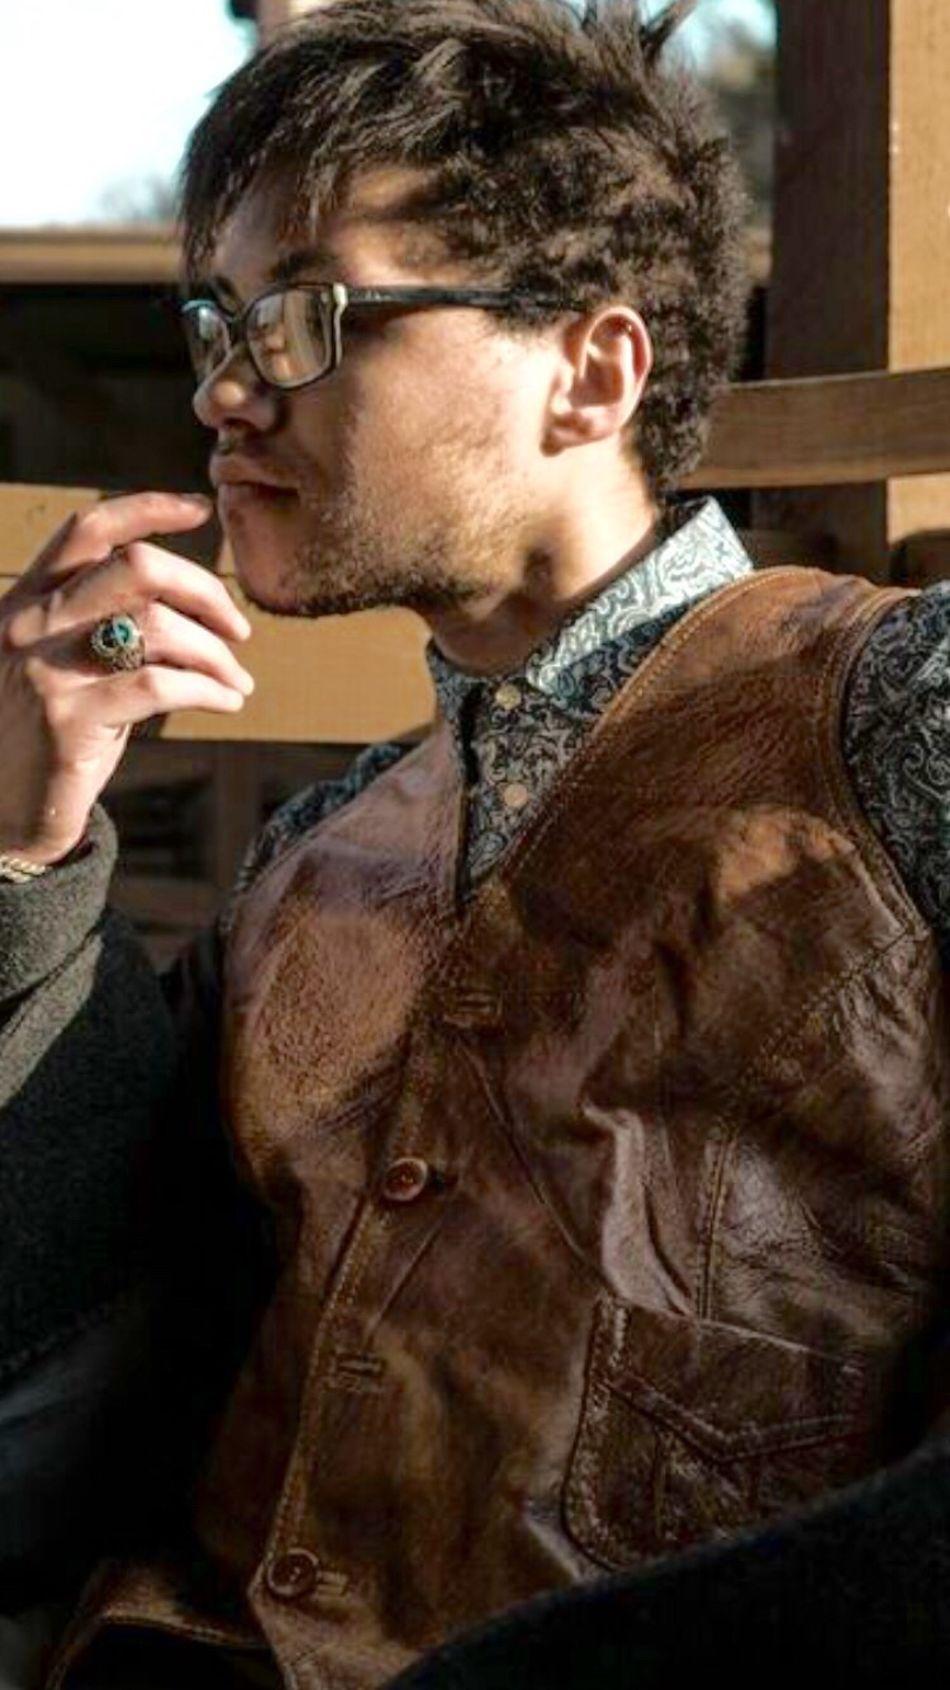 """ Johnny Depp "" influenced. Johnny Depp style on point 🤓🤓😎"